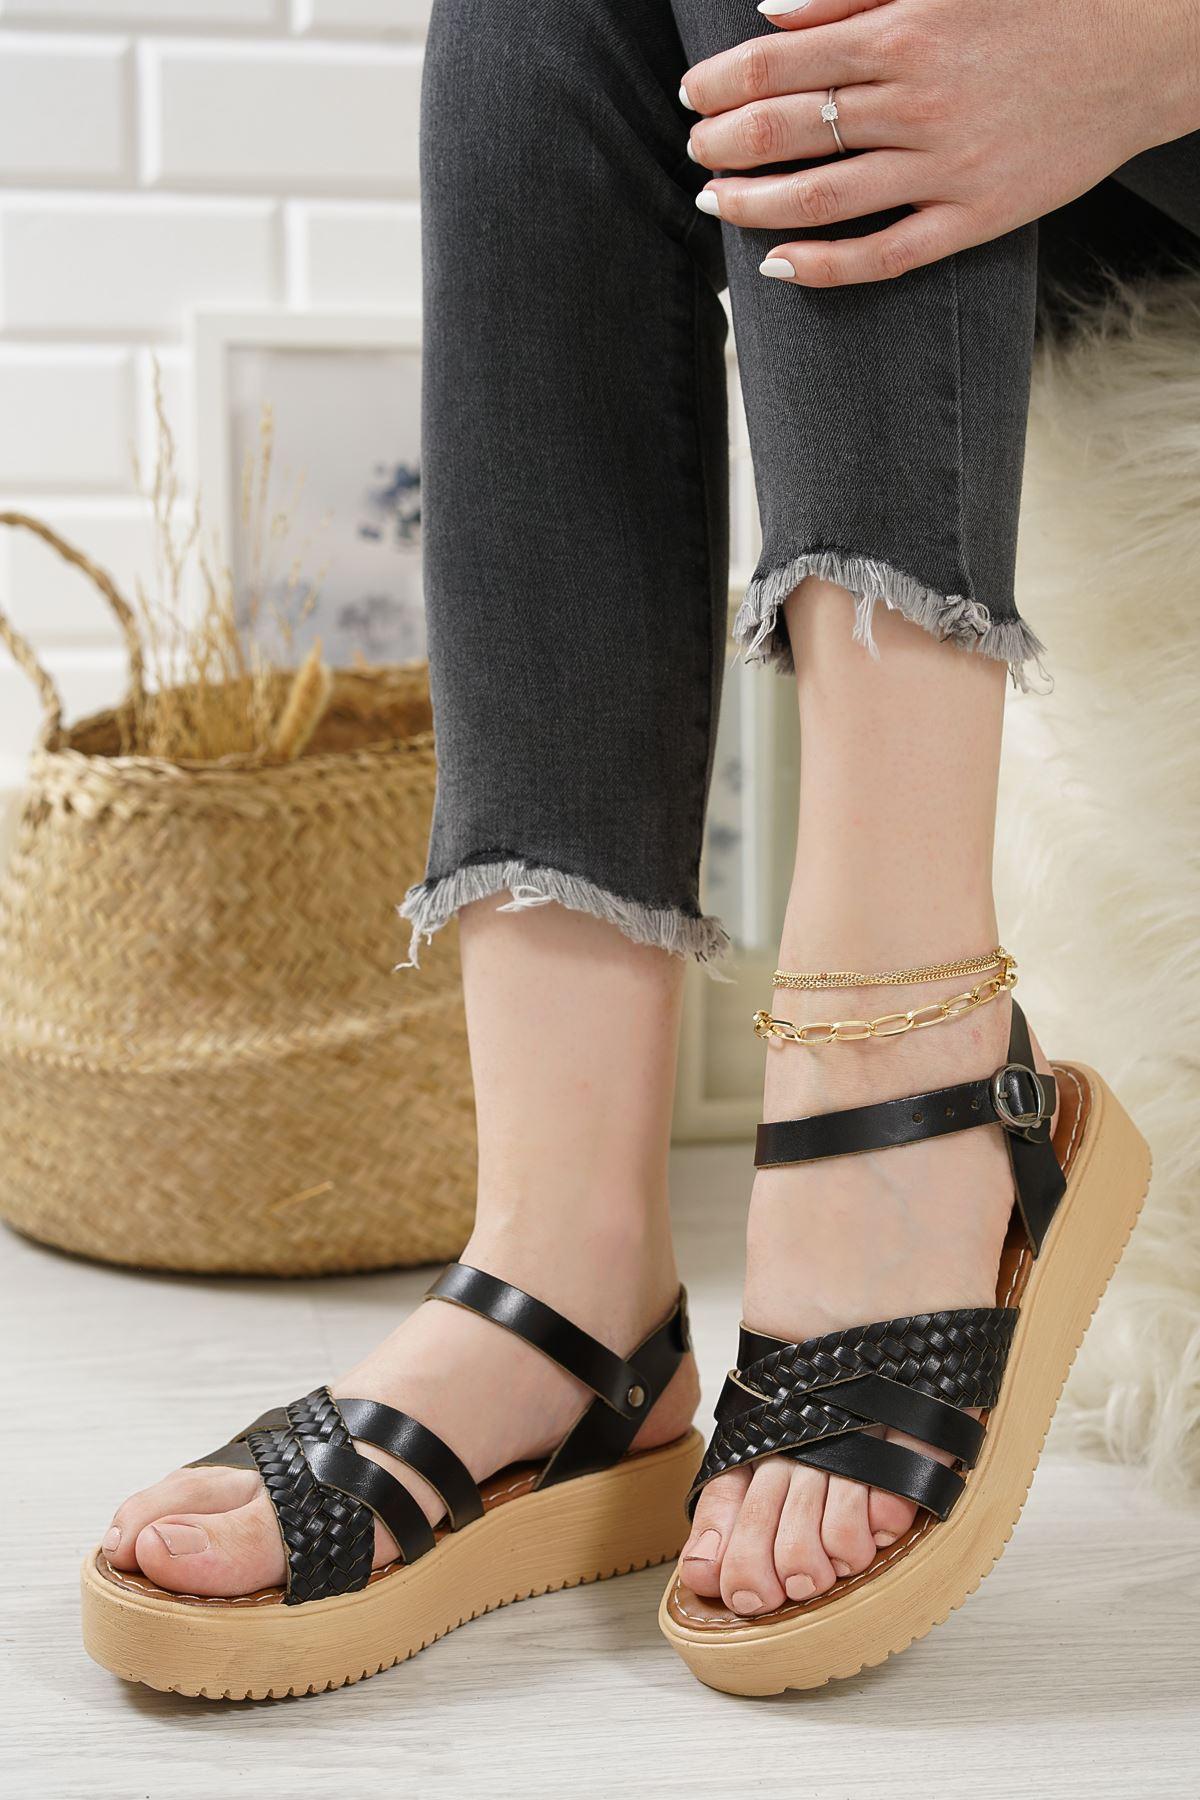 Jianna Siyah Hakiki Deri Kadın Sandalet